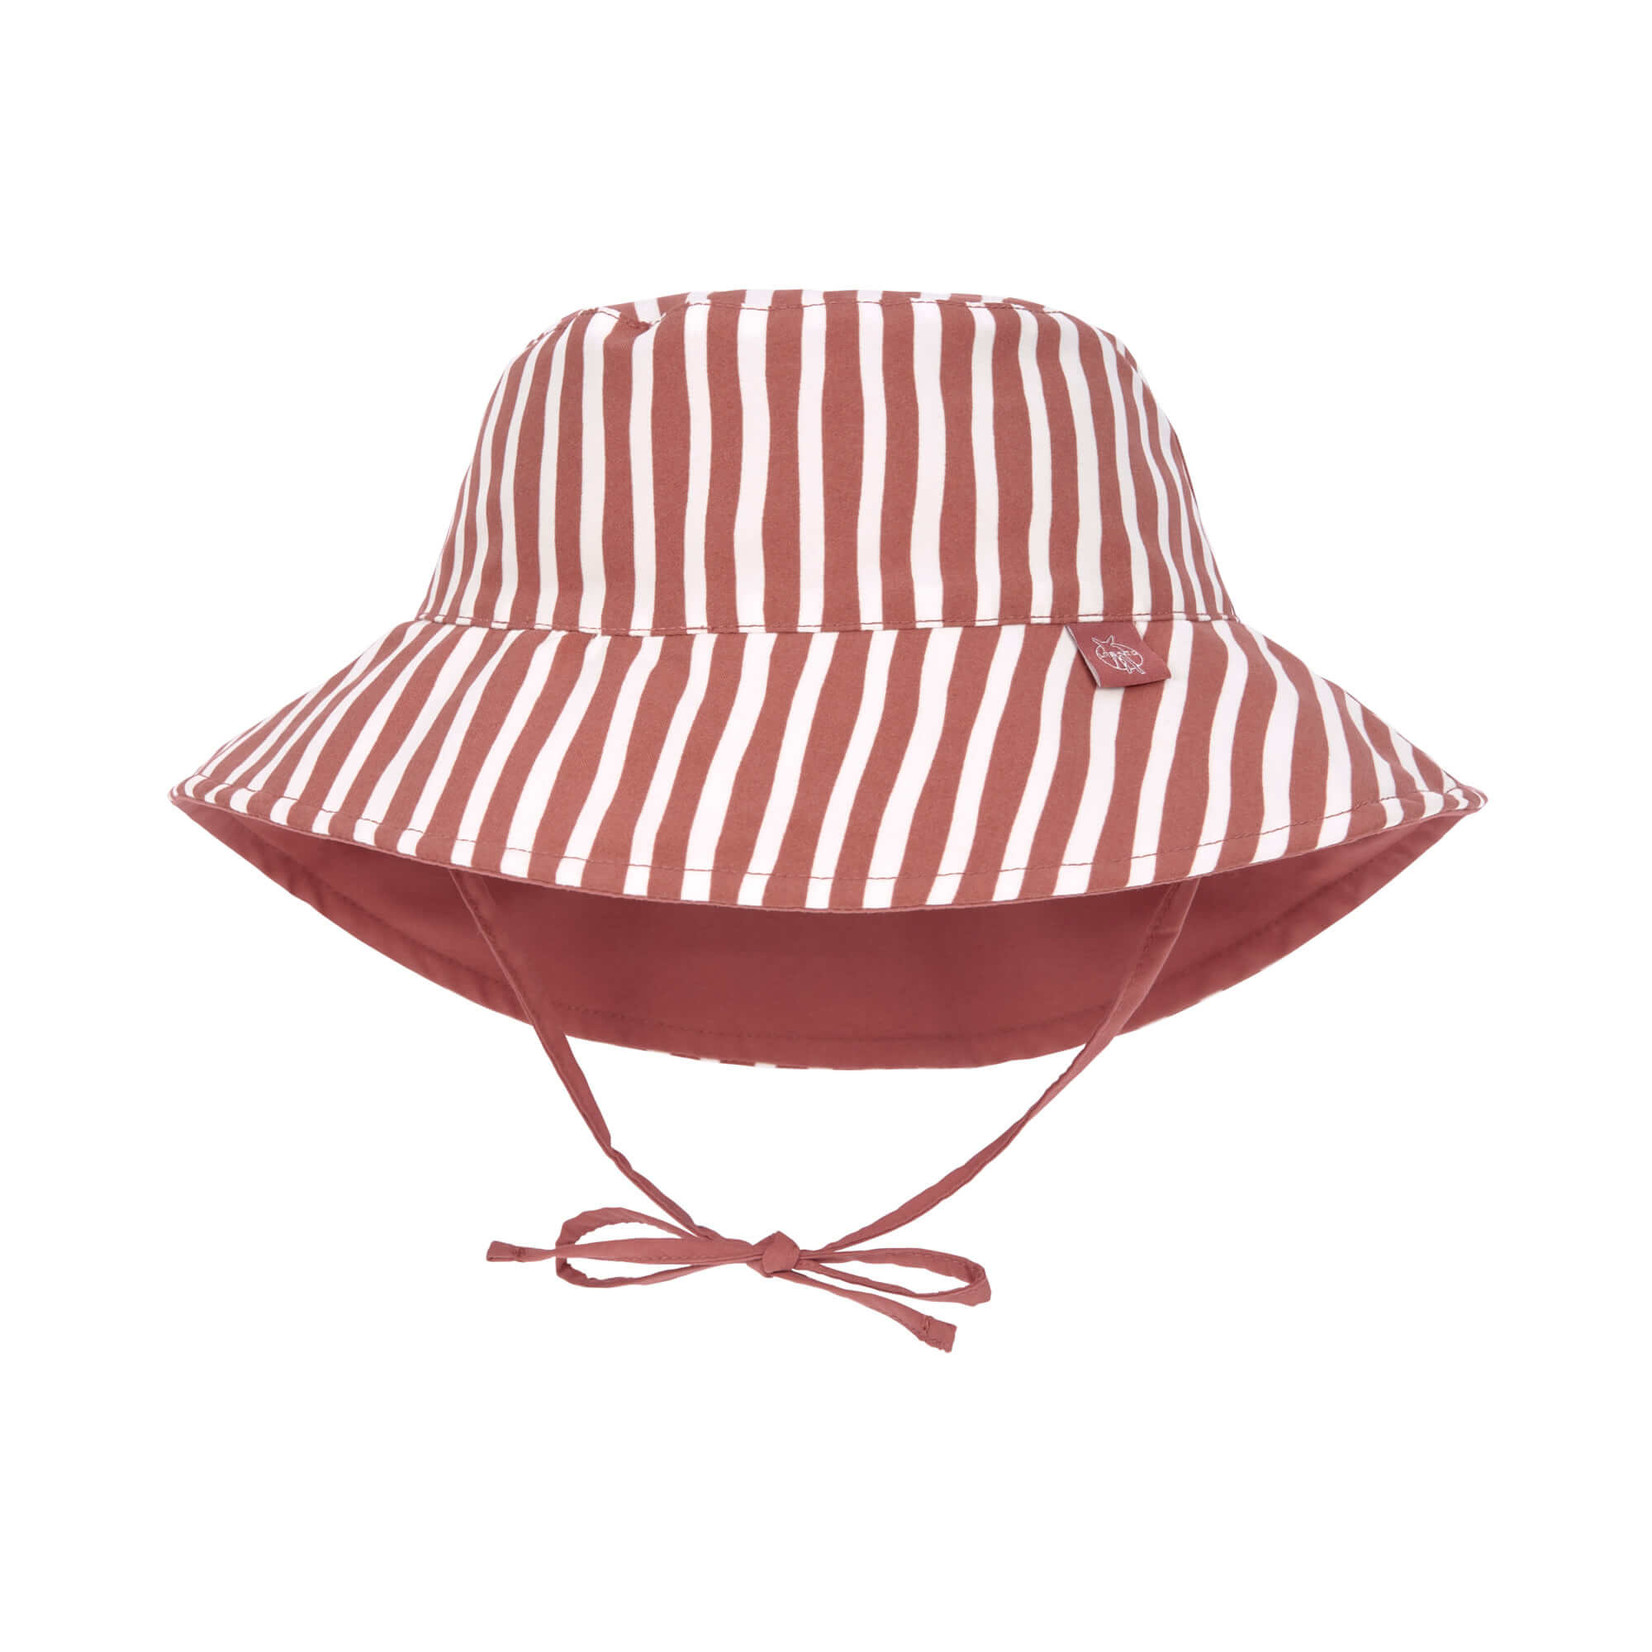 Lässig LSF Sun Protection Bucket Hat  Stripes Red